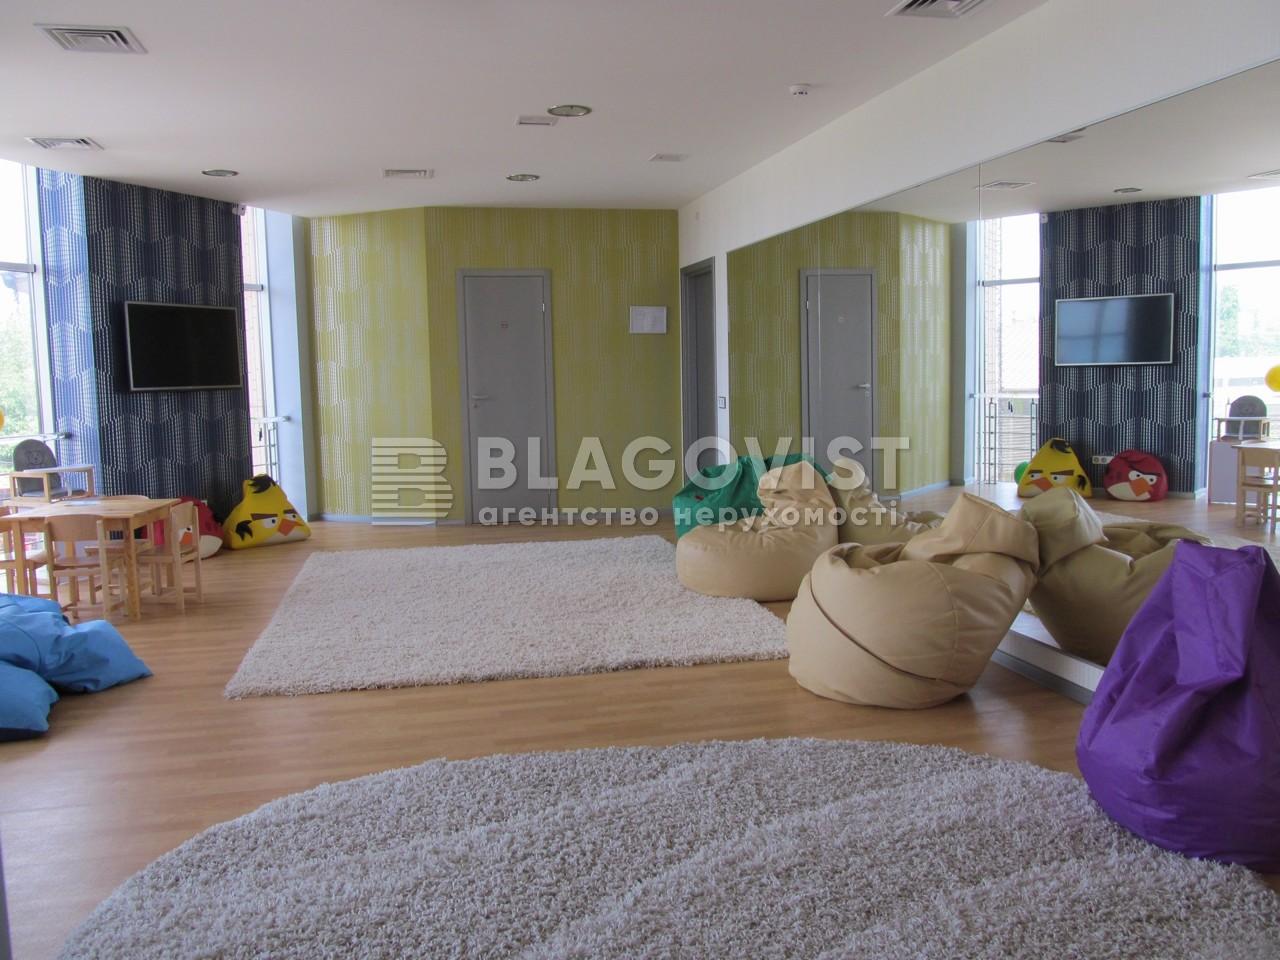 Нежитлове приміщення, H-37155, Садова (Осокорки), Київ - Фото 13